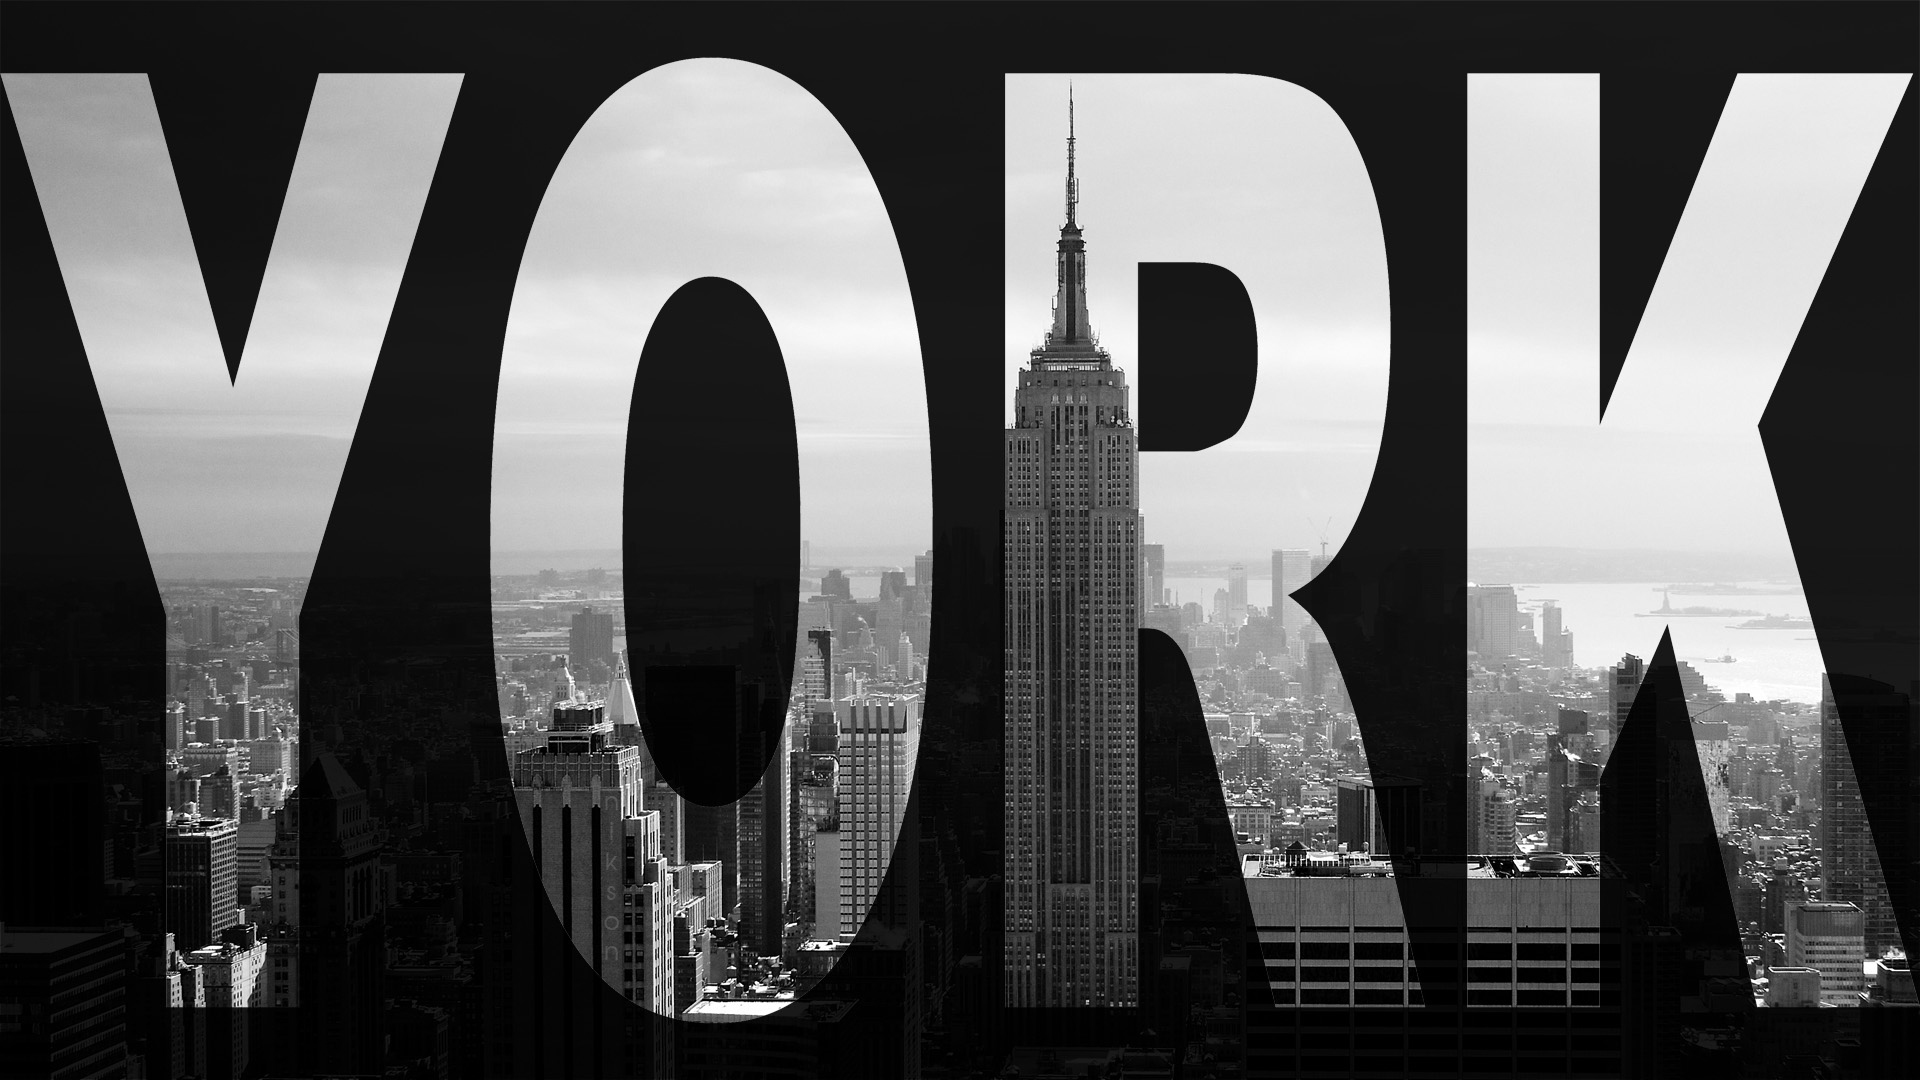 city new york skyscraper black and whitejpg 1920x1080